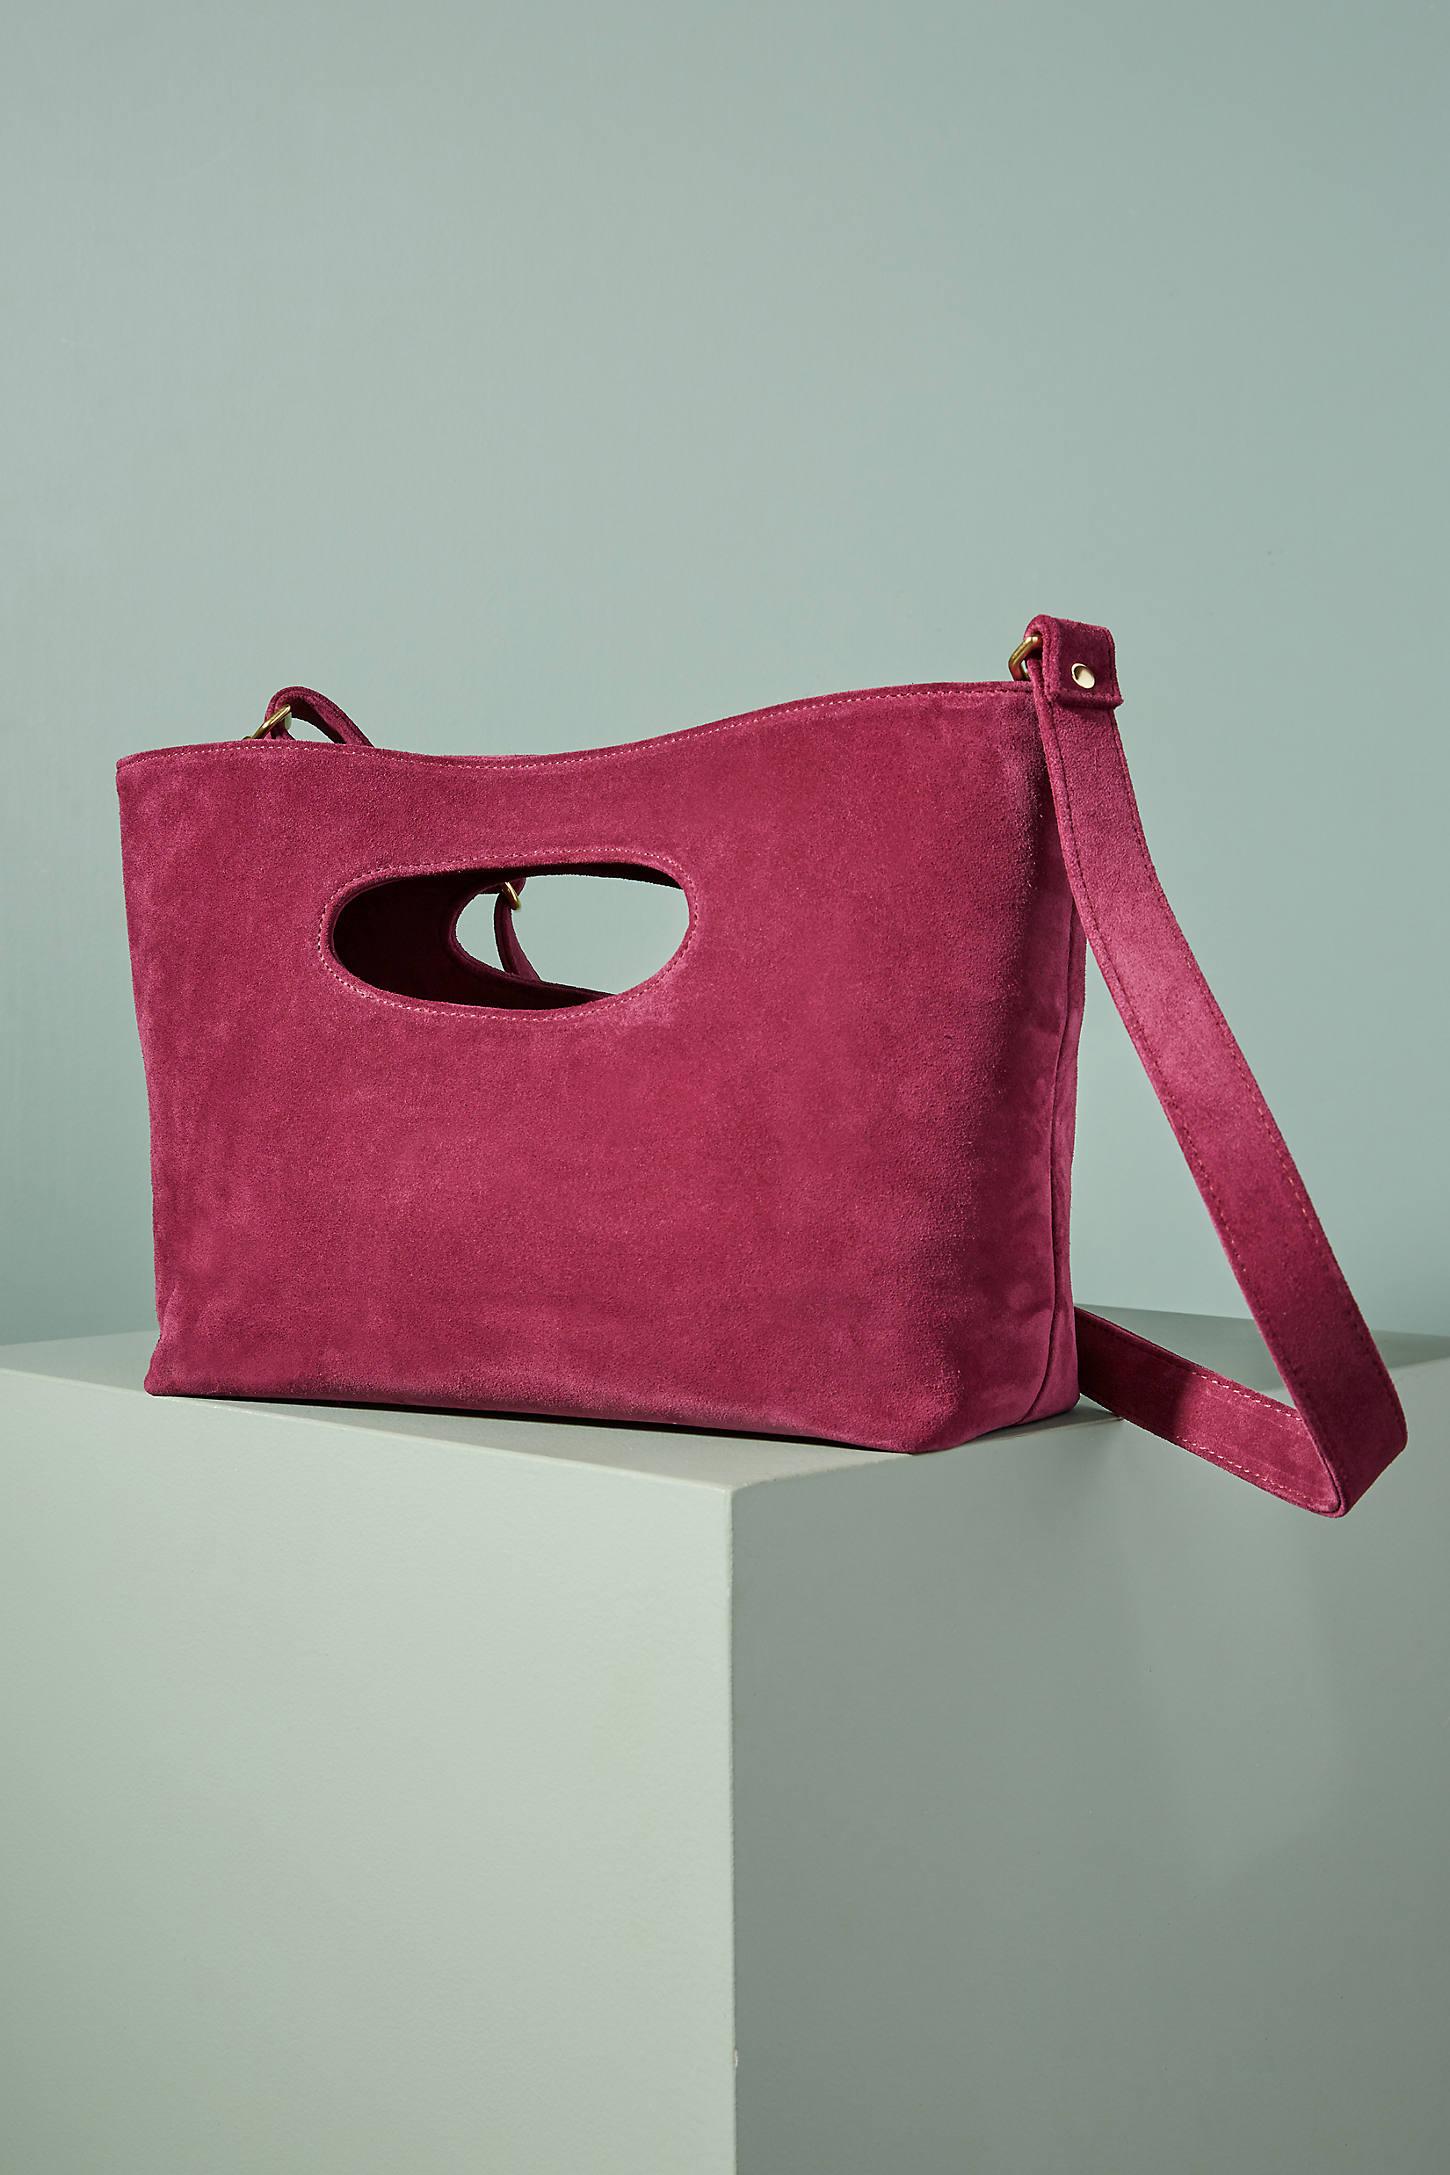 Ceri Hoover Alys Tote Bag